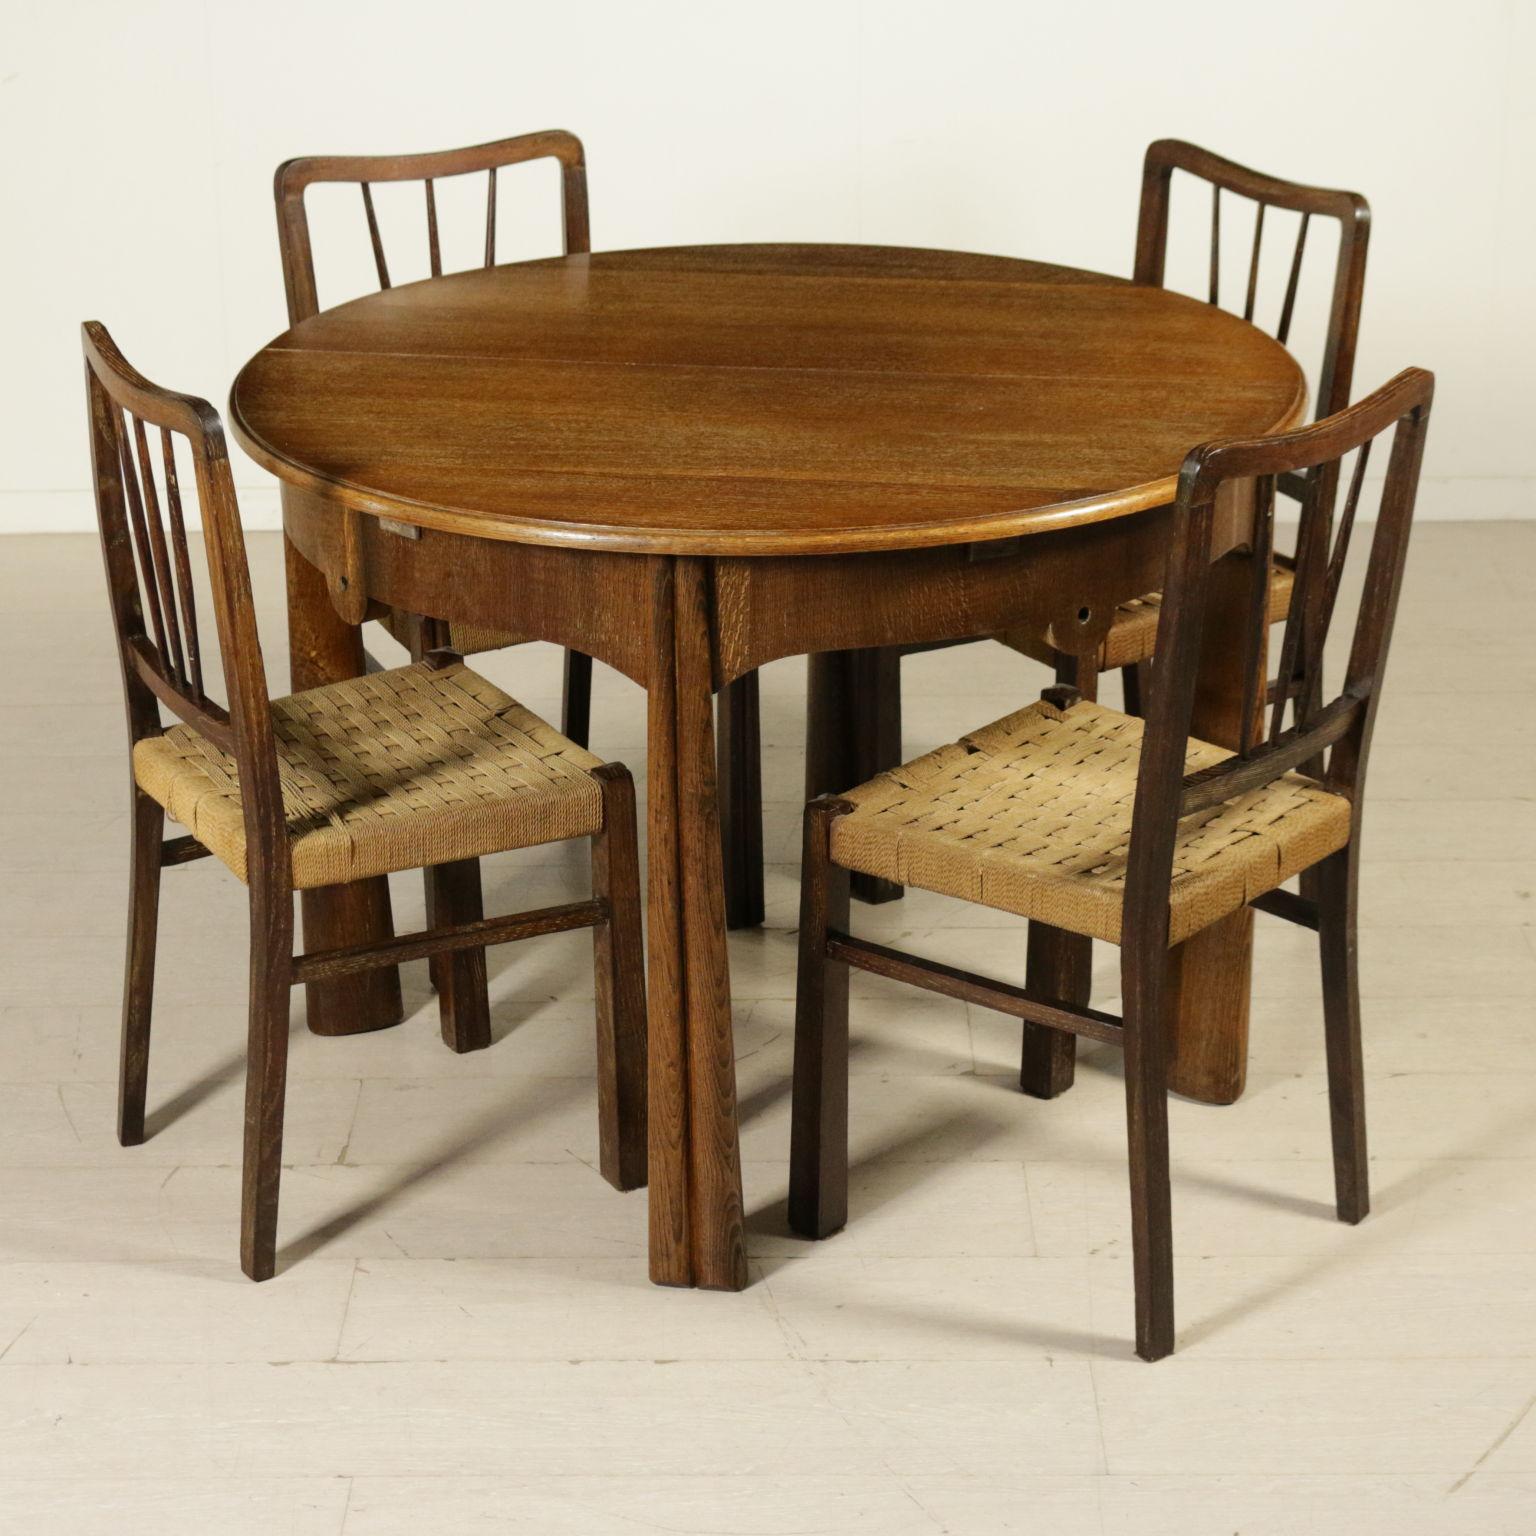 tisch 50er jahre tische modernes design. Black Bedroom Furniture Sets. Home Design Ideas